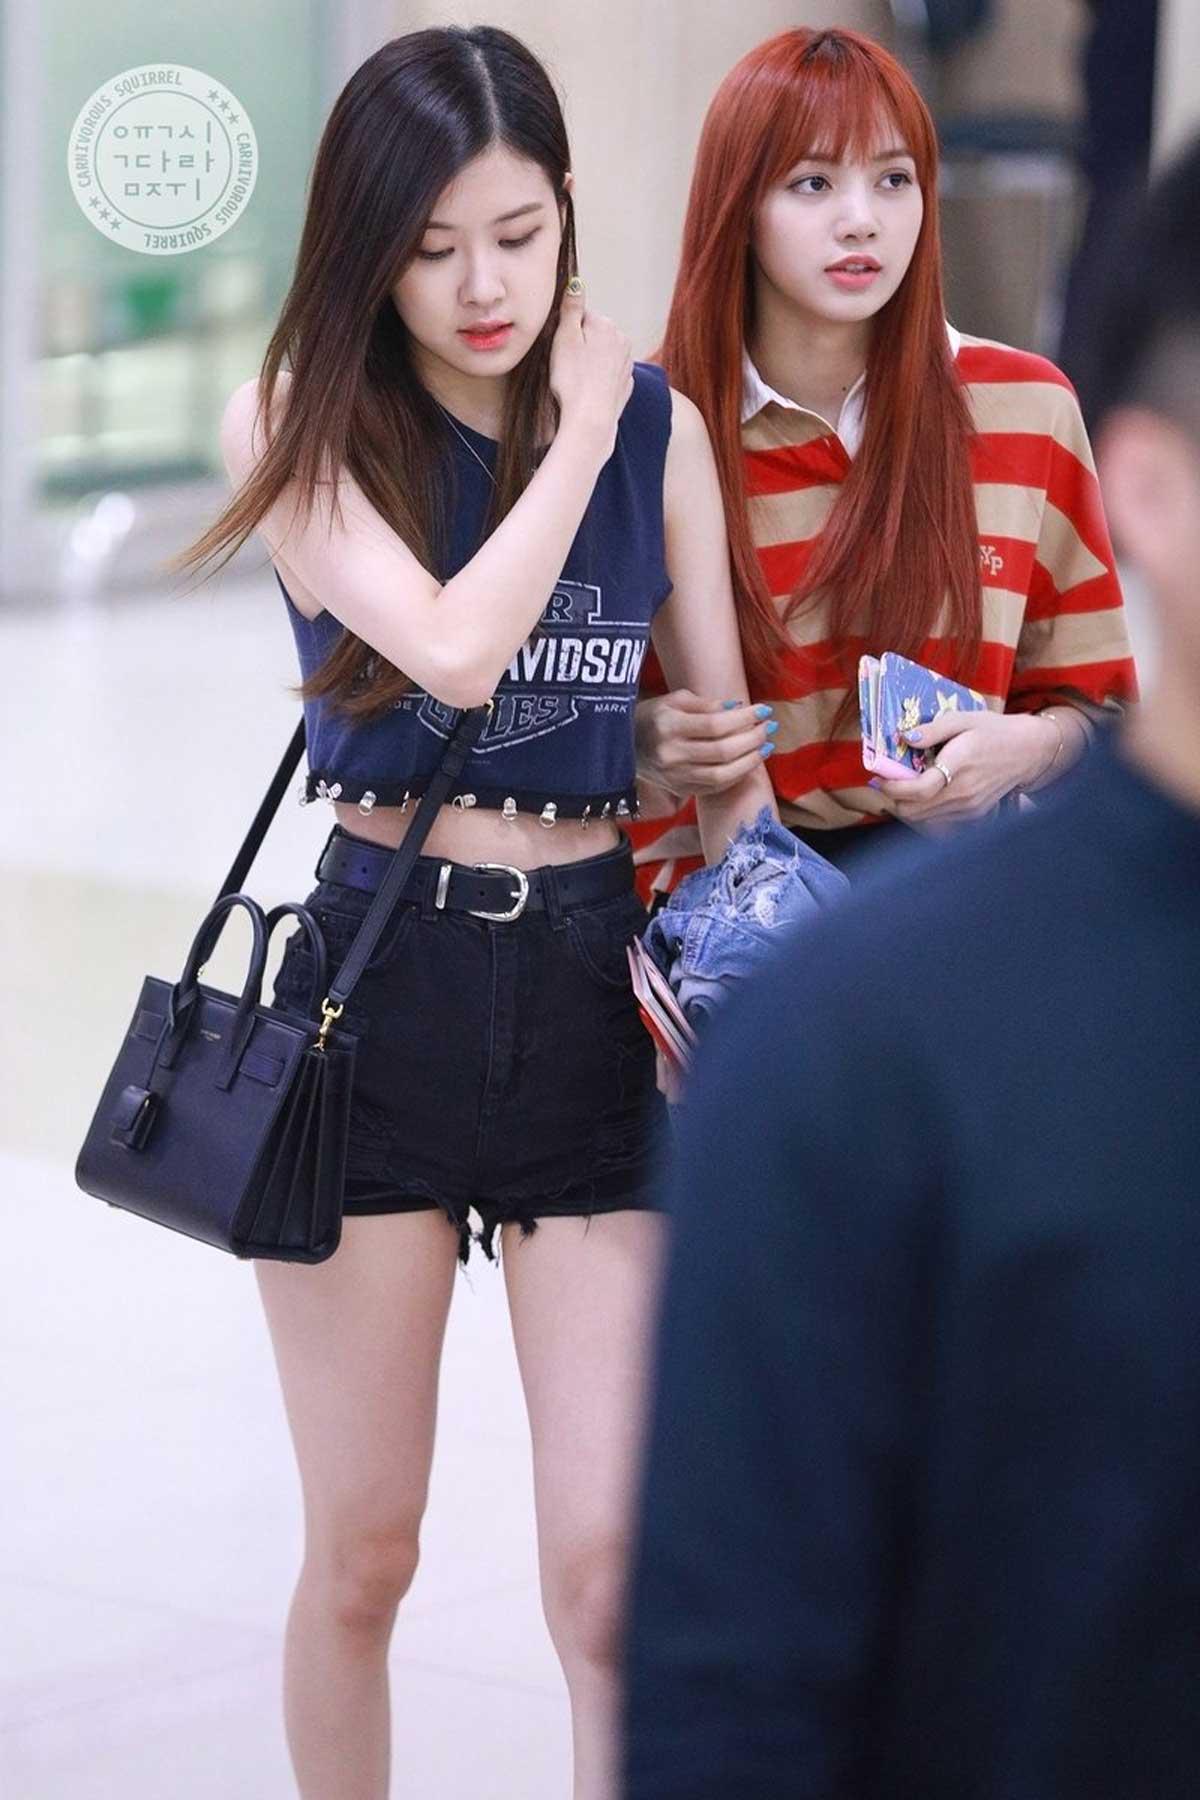 Blackpink Rose Airport Fashion 7 August 2018